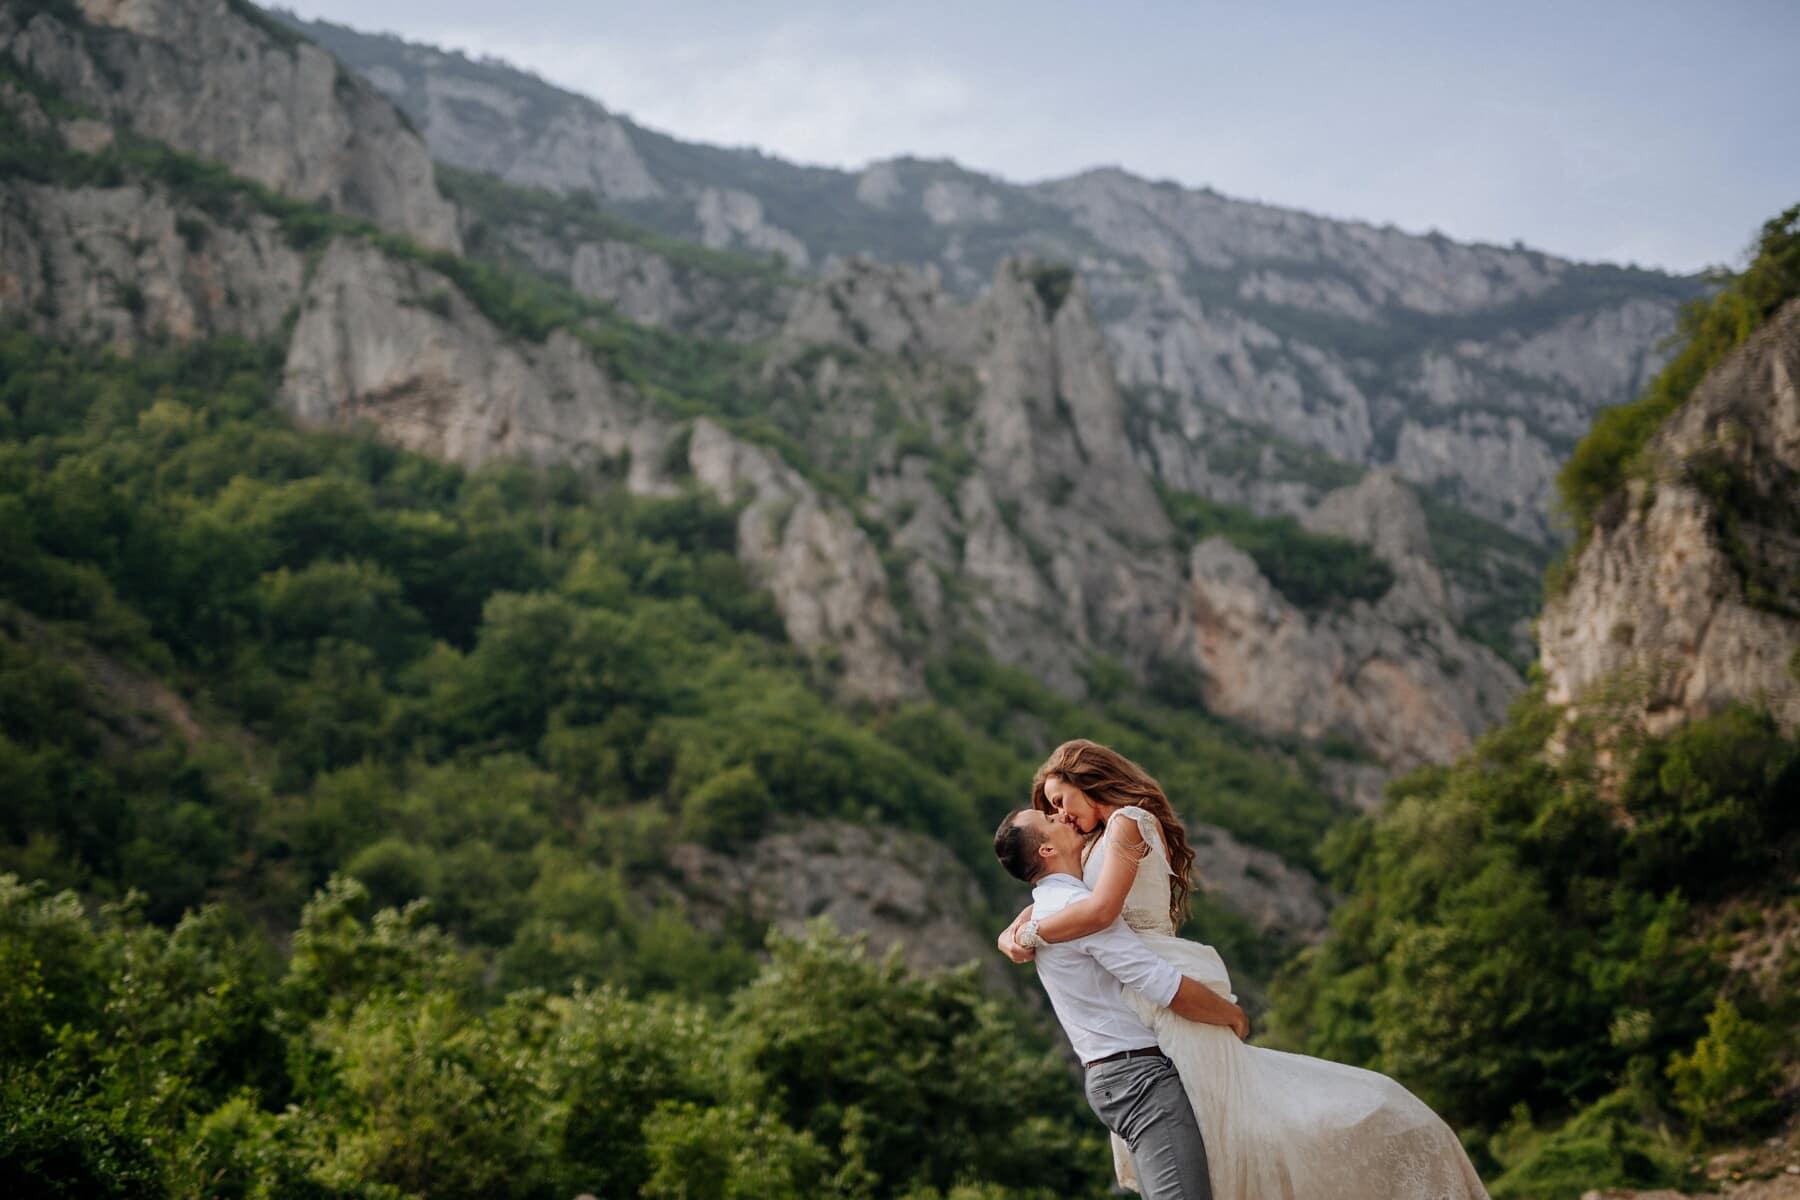 boyfriend, mountainside, girlfriend, mountain peak, love, hugging, nature, outdoors, mountains, mountain